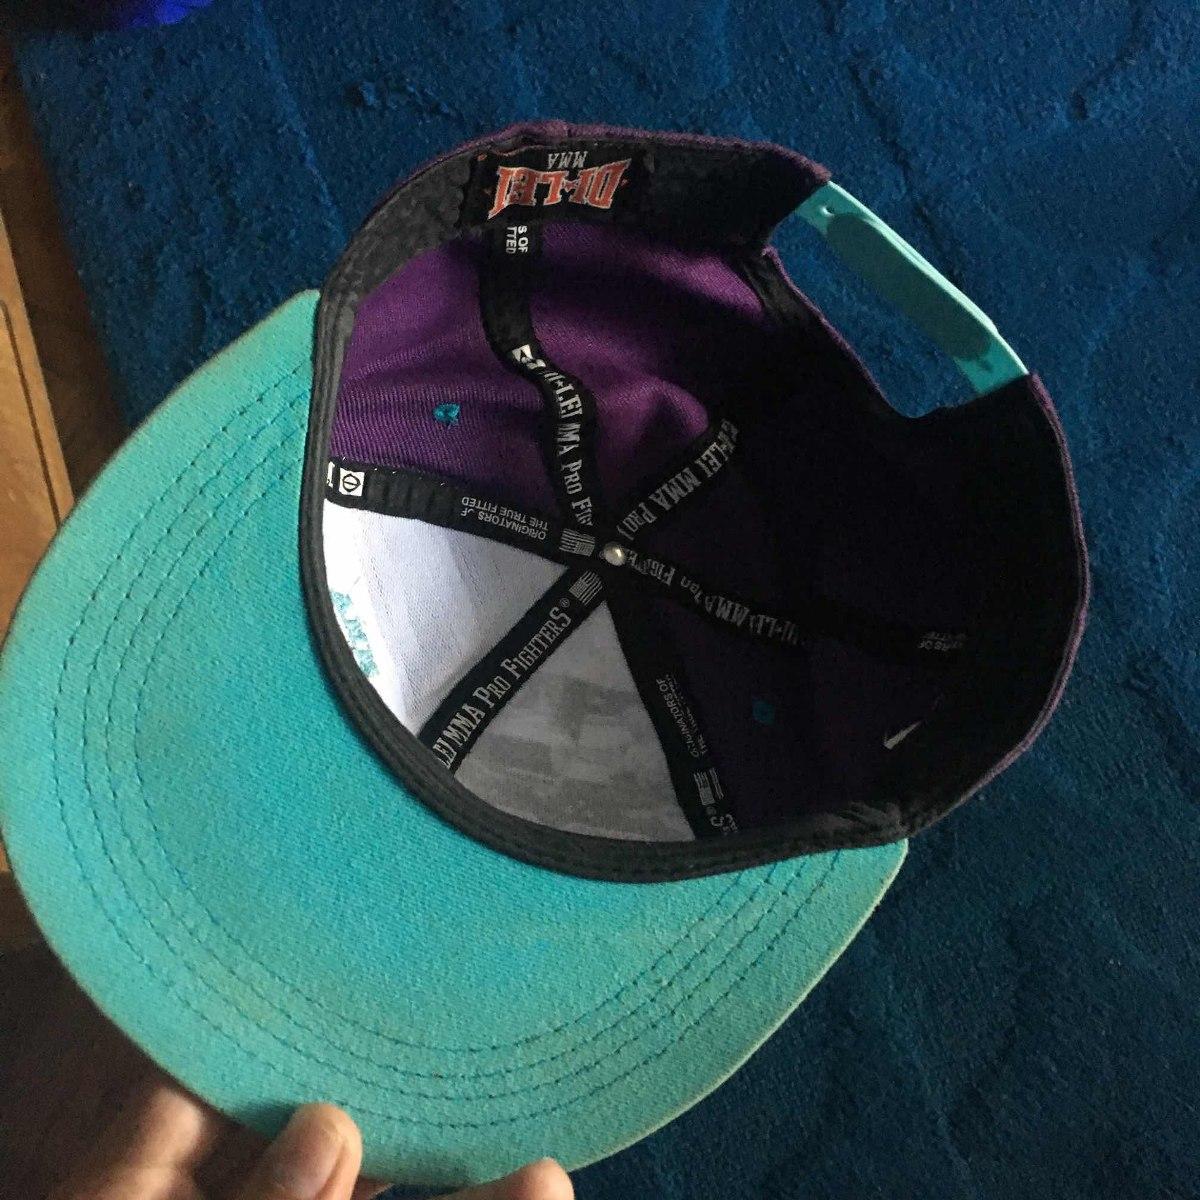 bcad57c5ea78d gorro visera plana violeta original. 2 Fotos